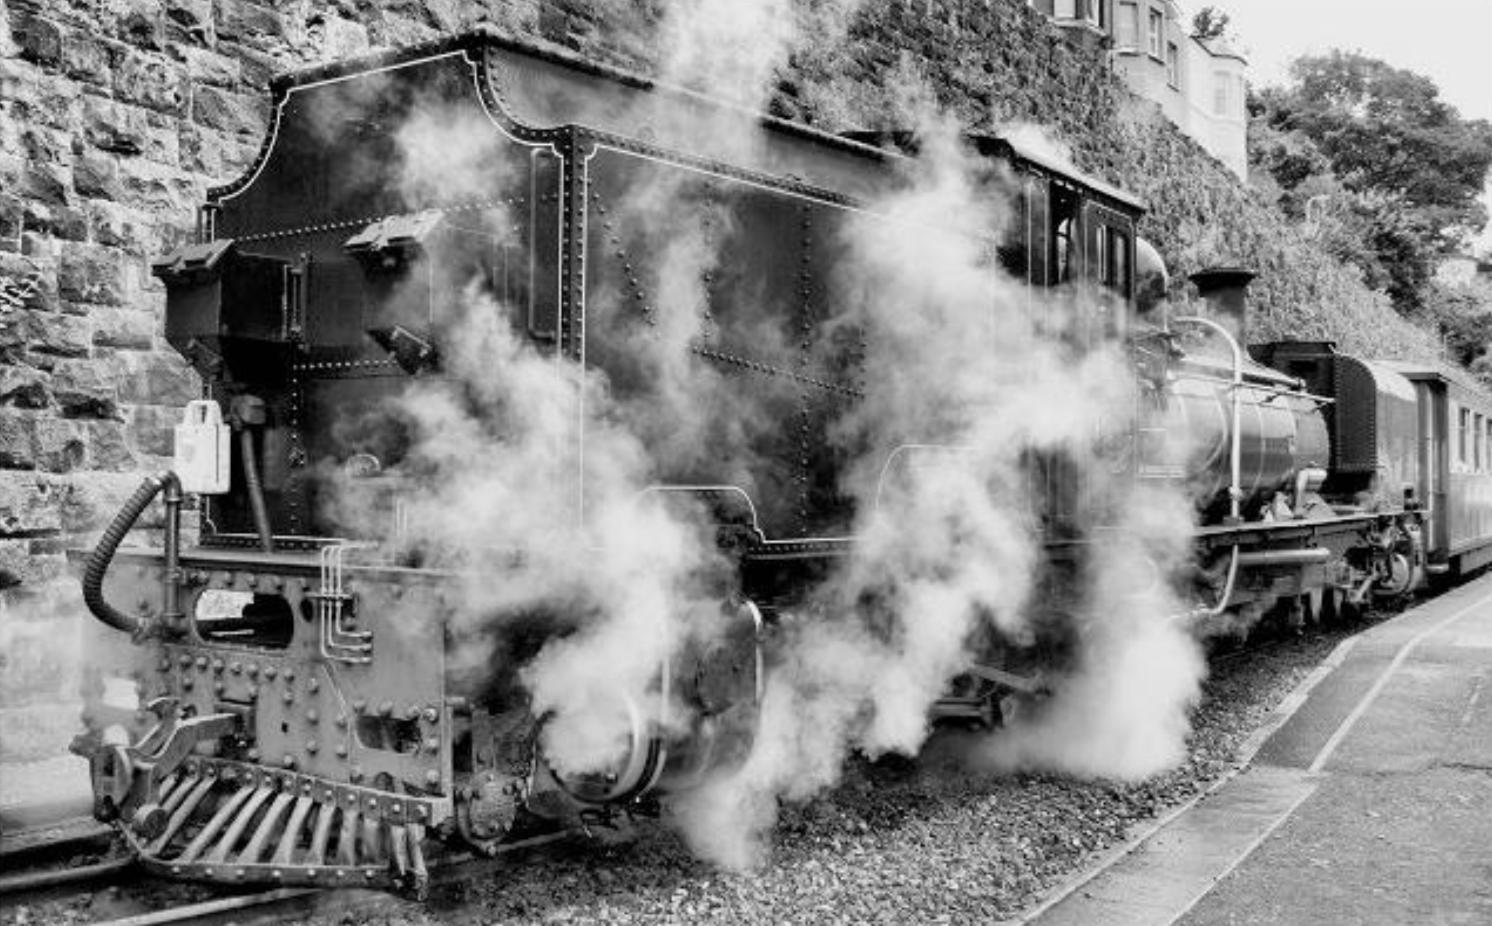 Ex-South African Railways Class 16 Garratt locomotive simmering at Caernarfon on the Welsh Highland Railway  Photo by Tony Richards.